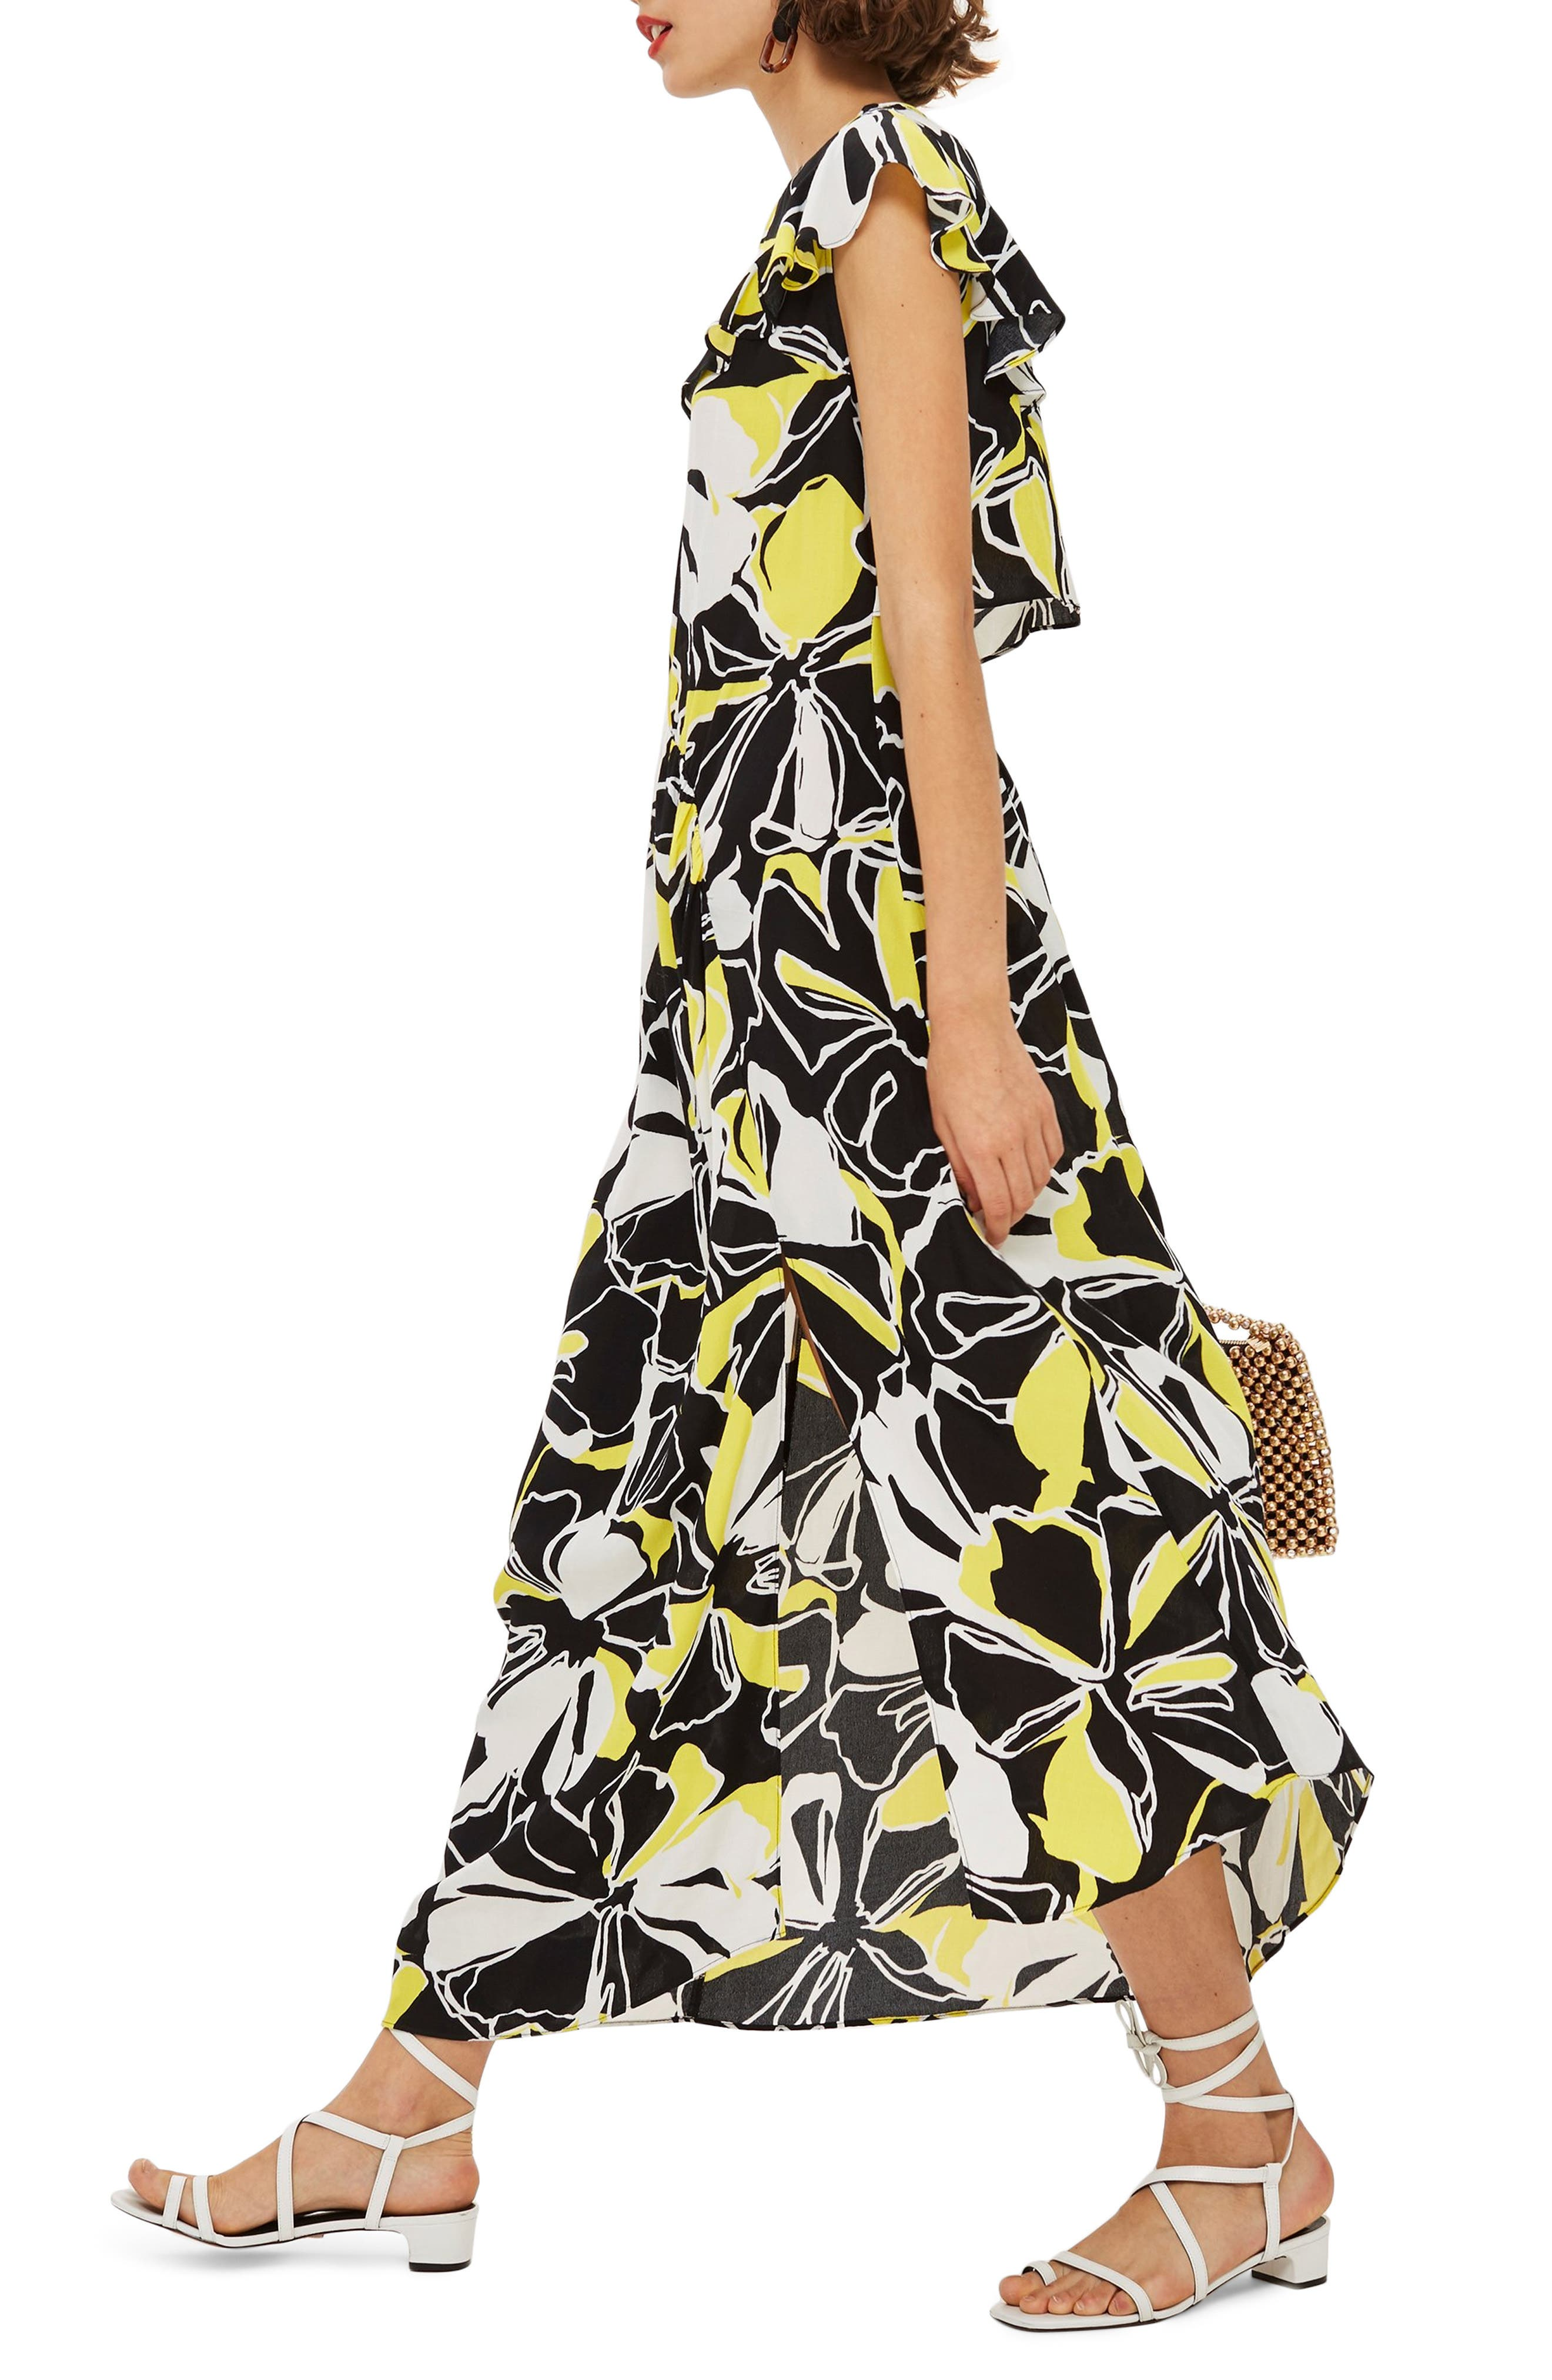 Deconstructed Floral Print Maxi Dress,                             Alternate thumbnail 3, color,                             BLACK MULTI